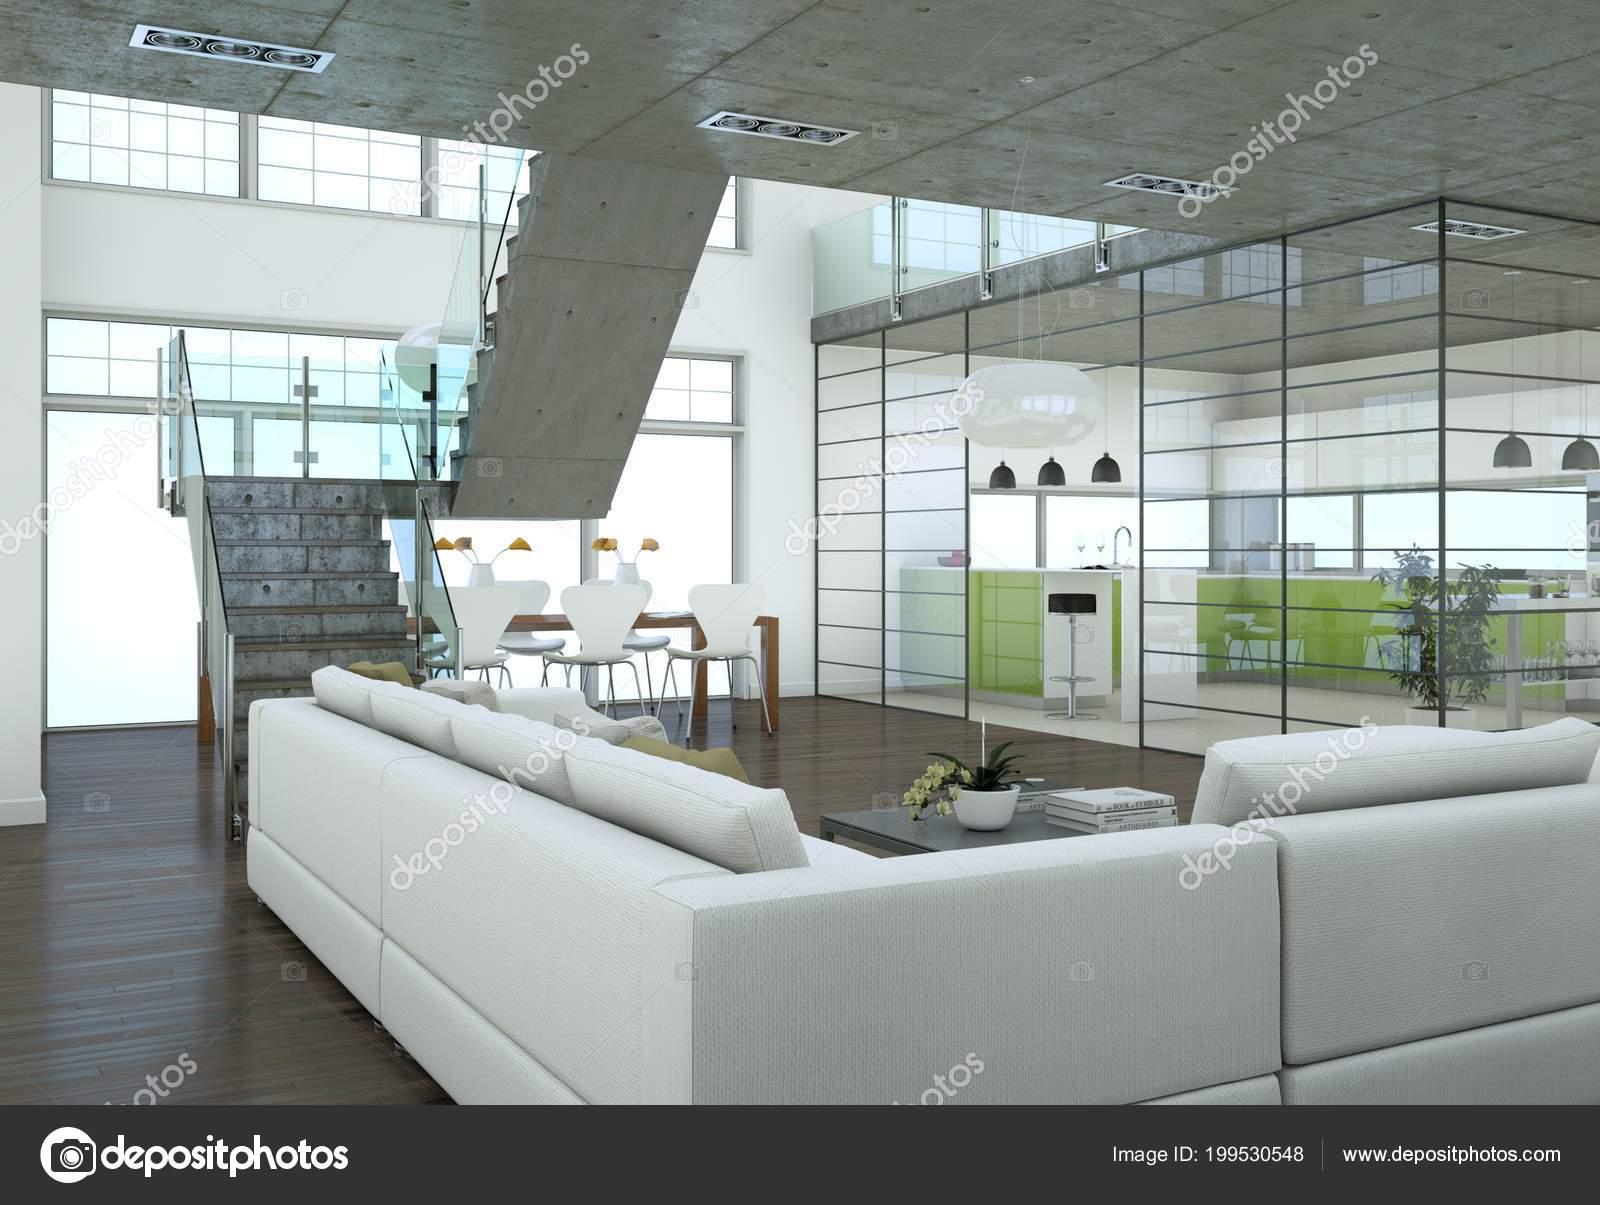 Minimalistic Loft Interior Design Sofas Concrete Walls Rendering Stock Photo